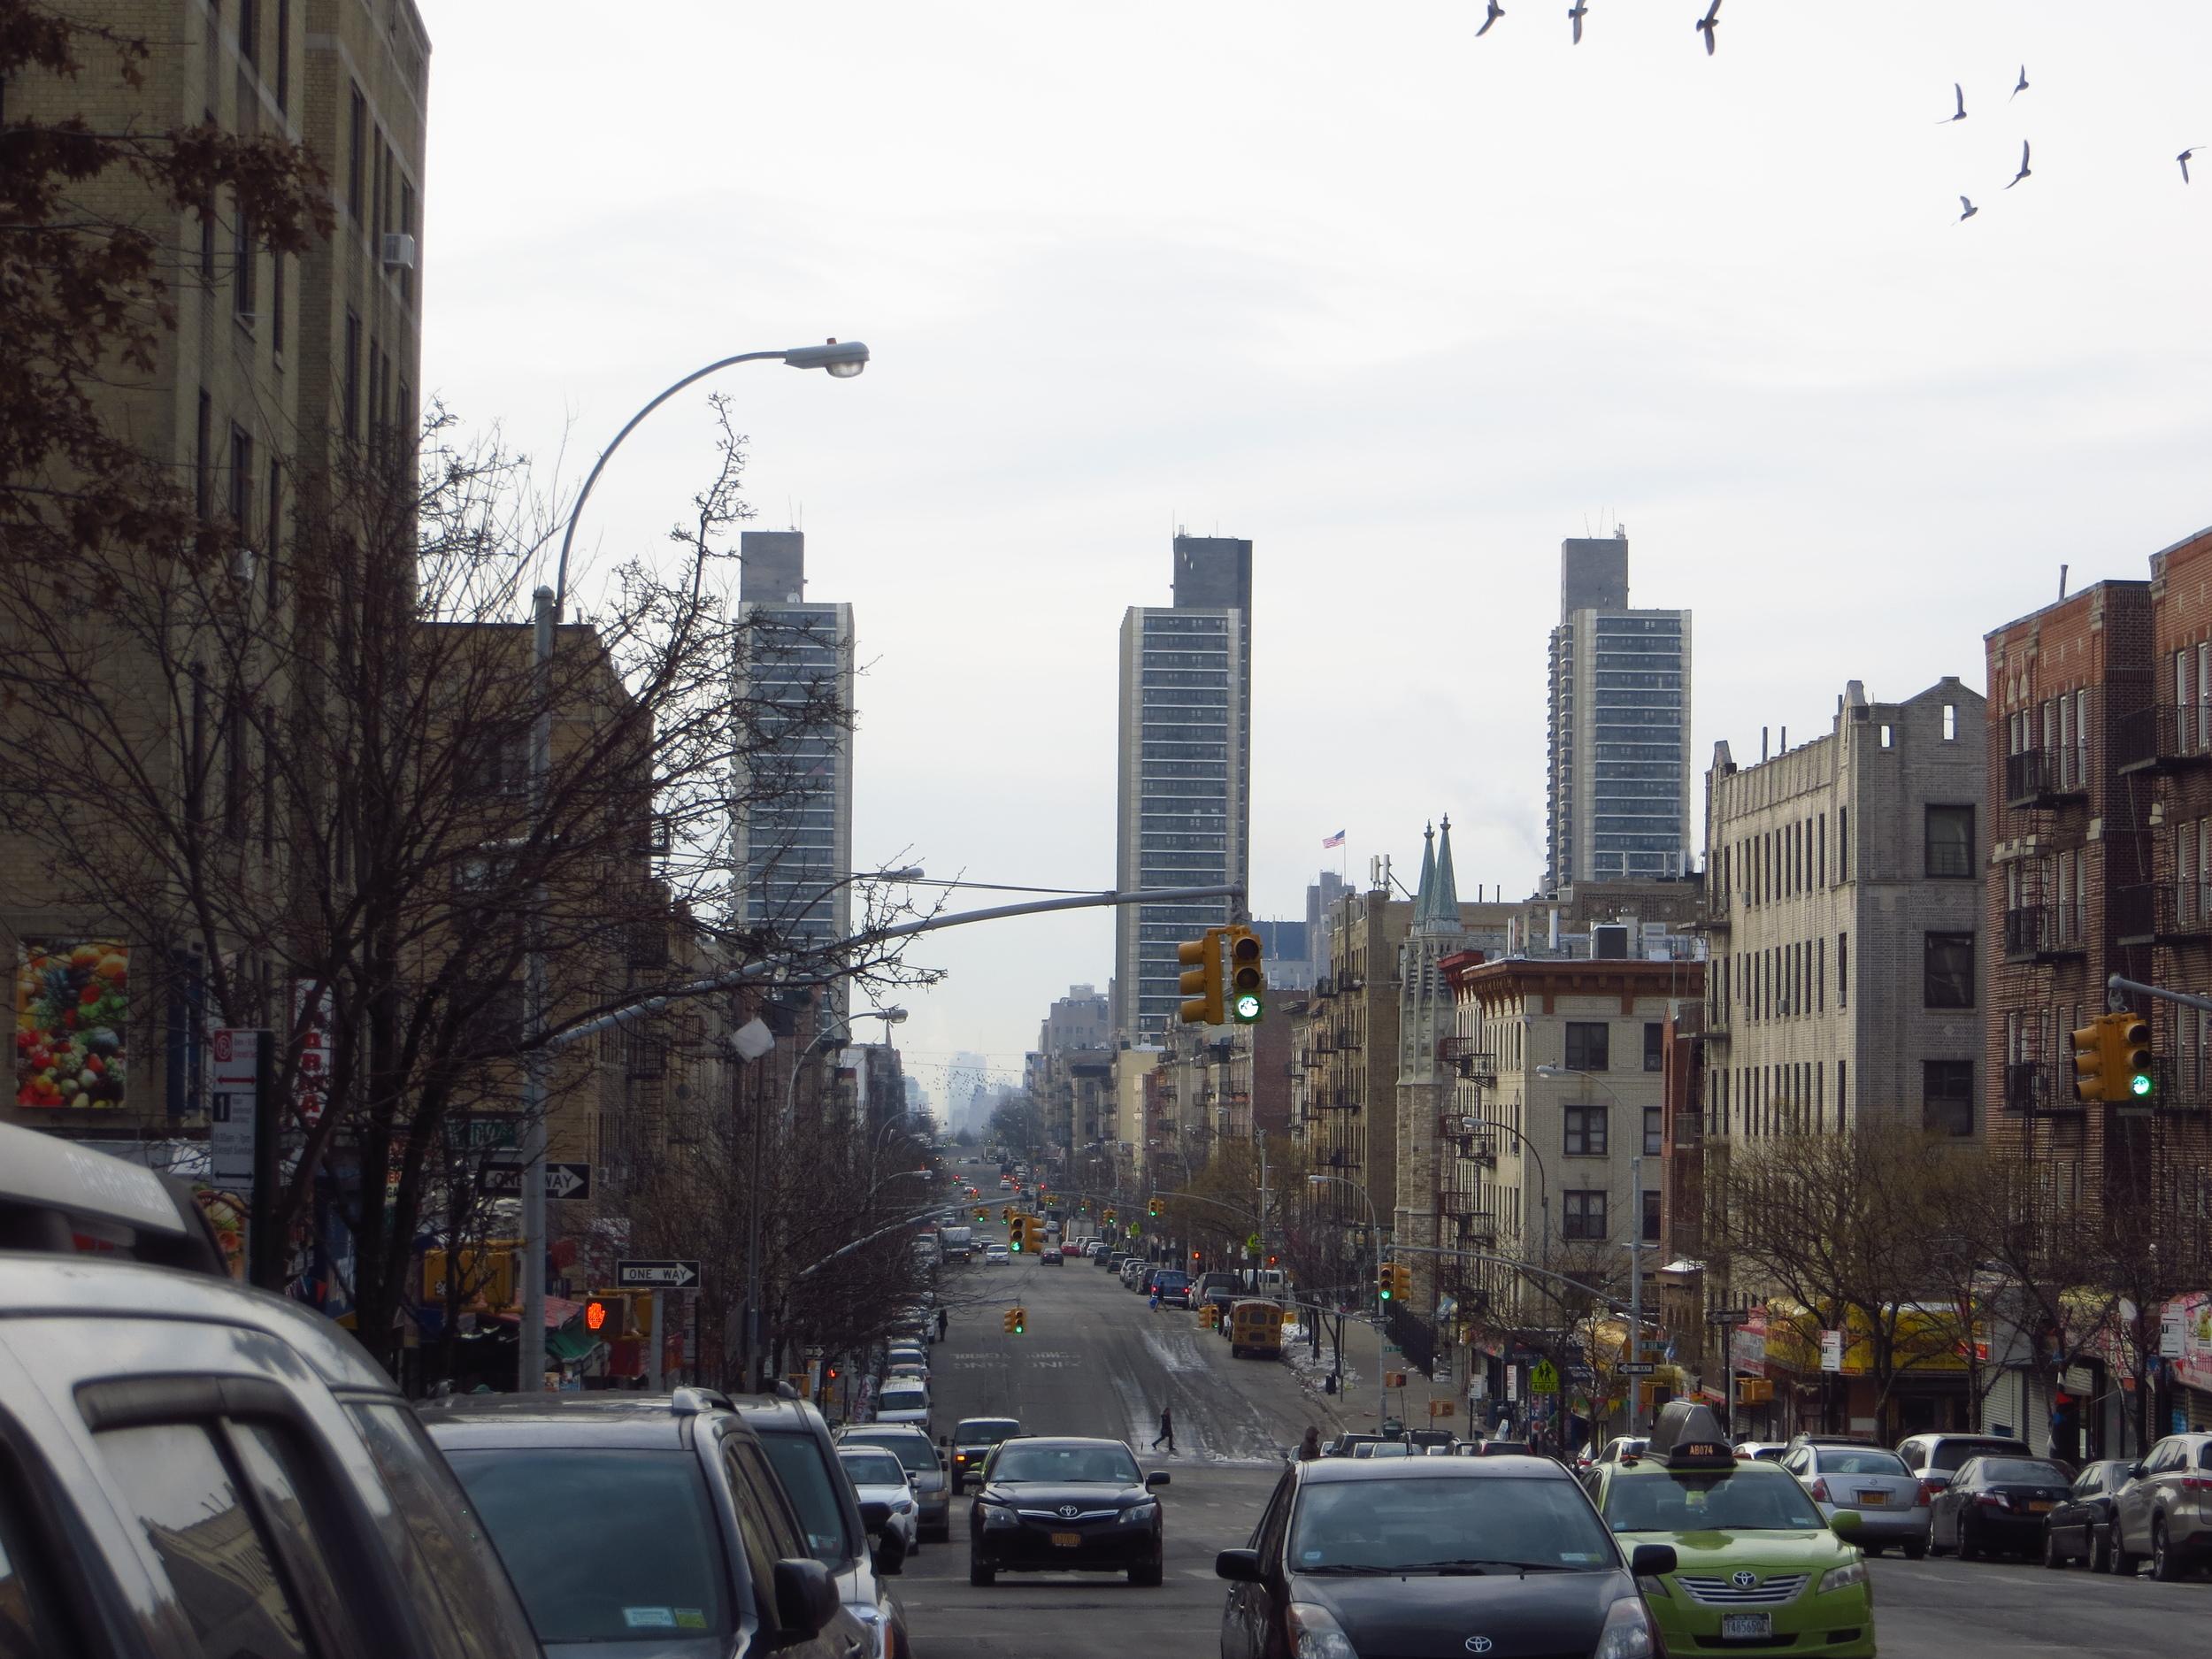 View down St. Nicholas Ave